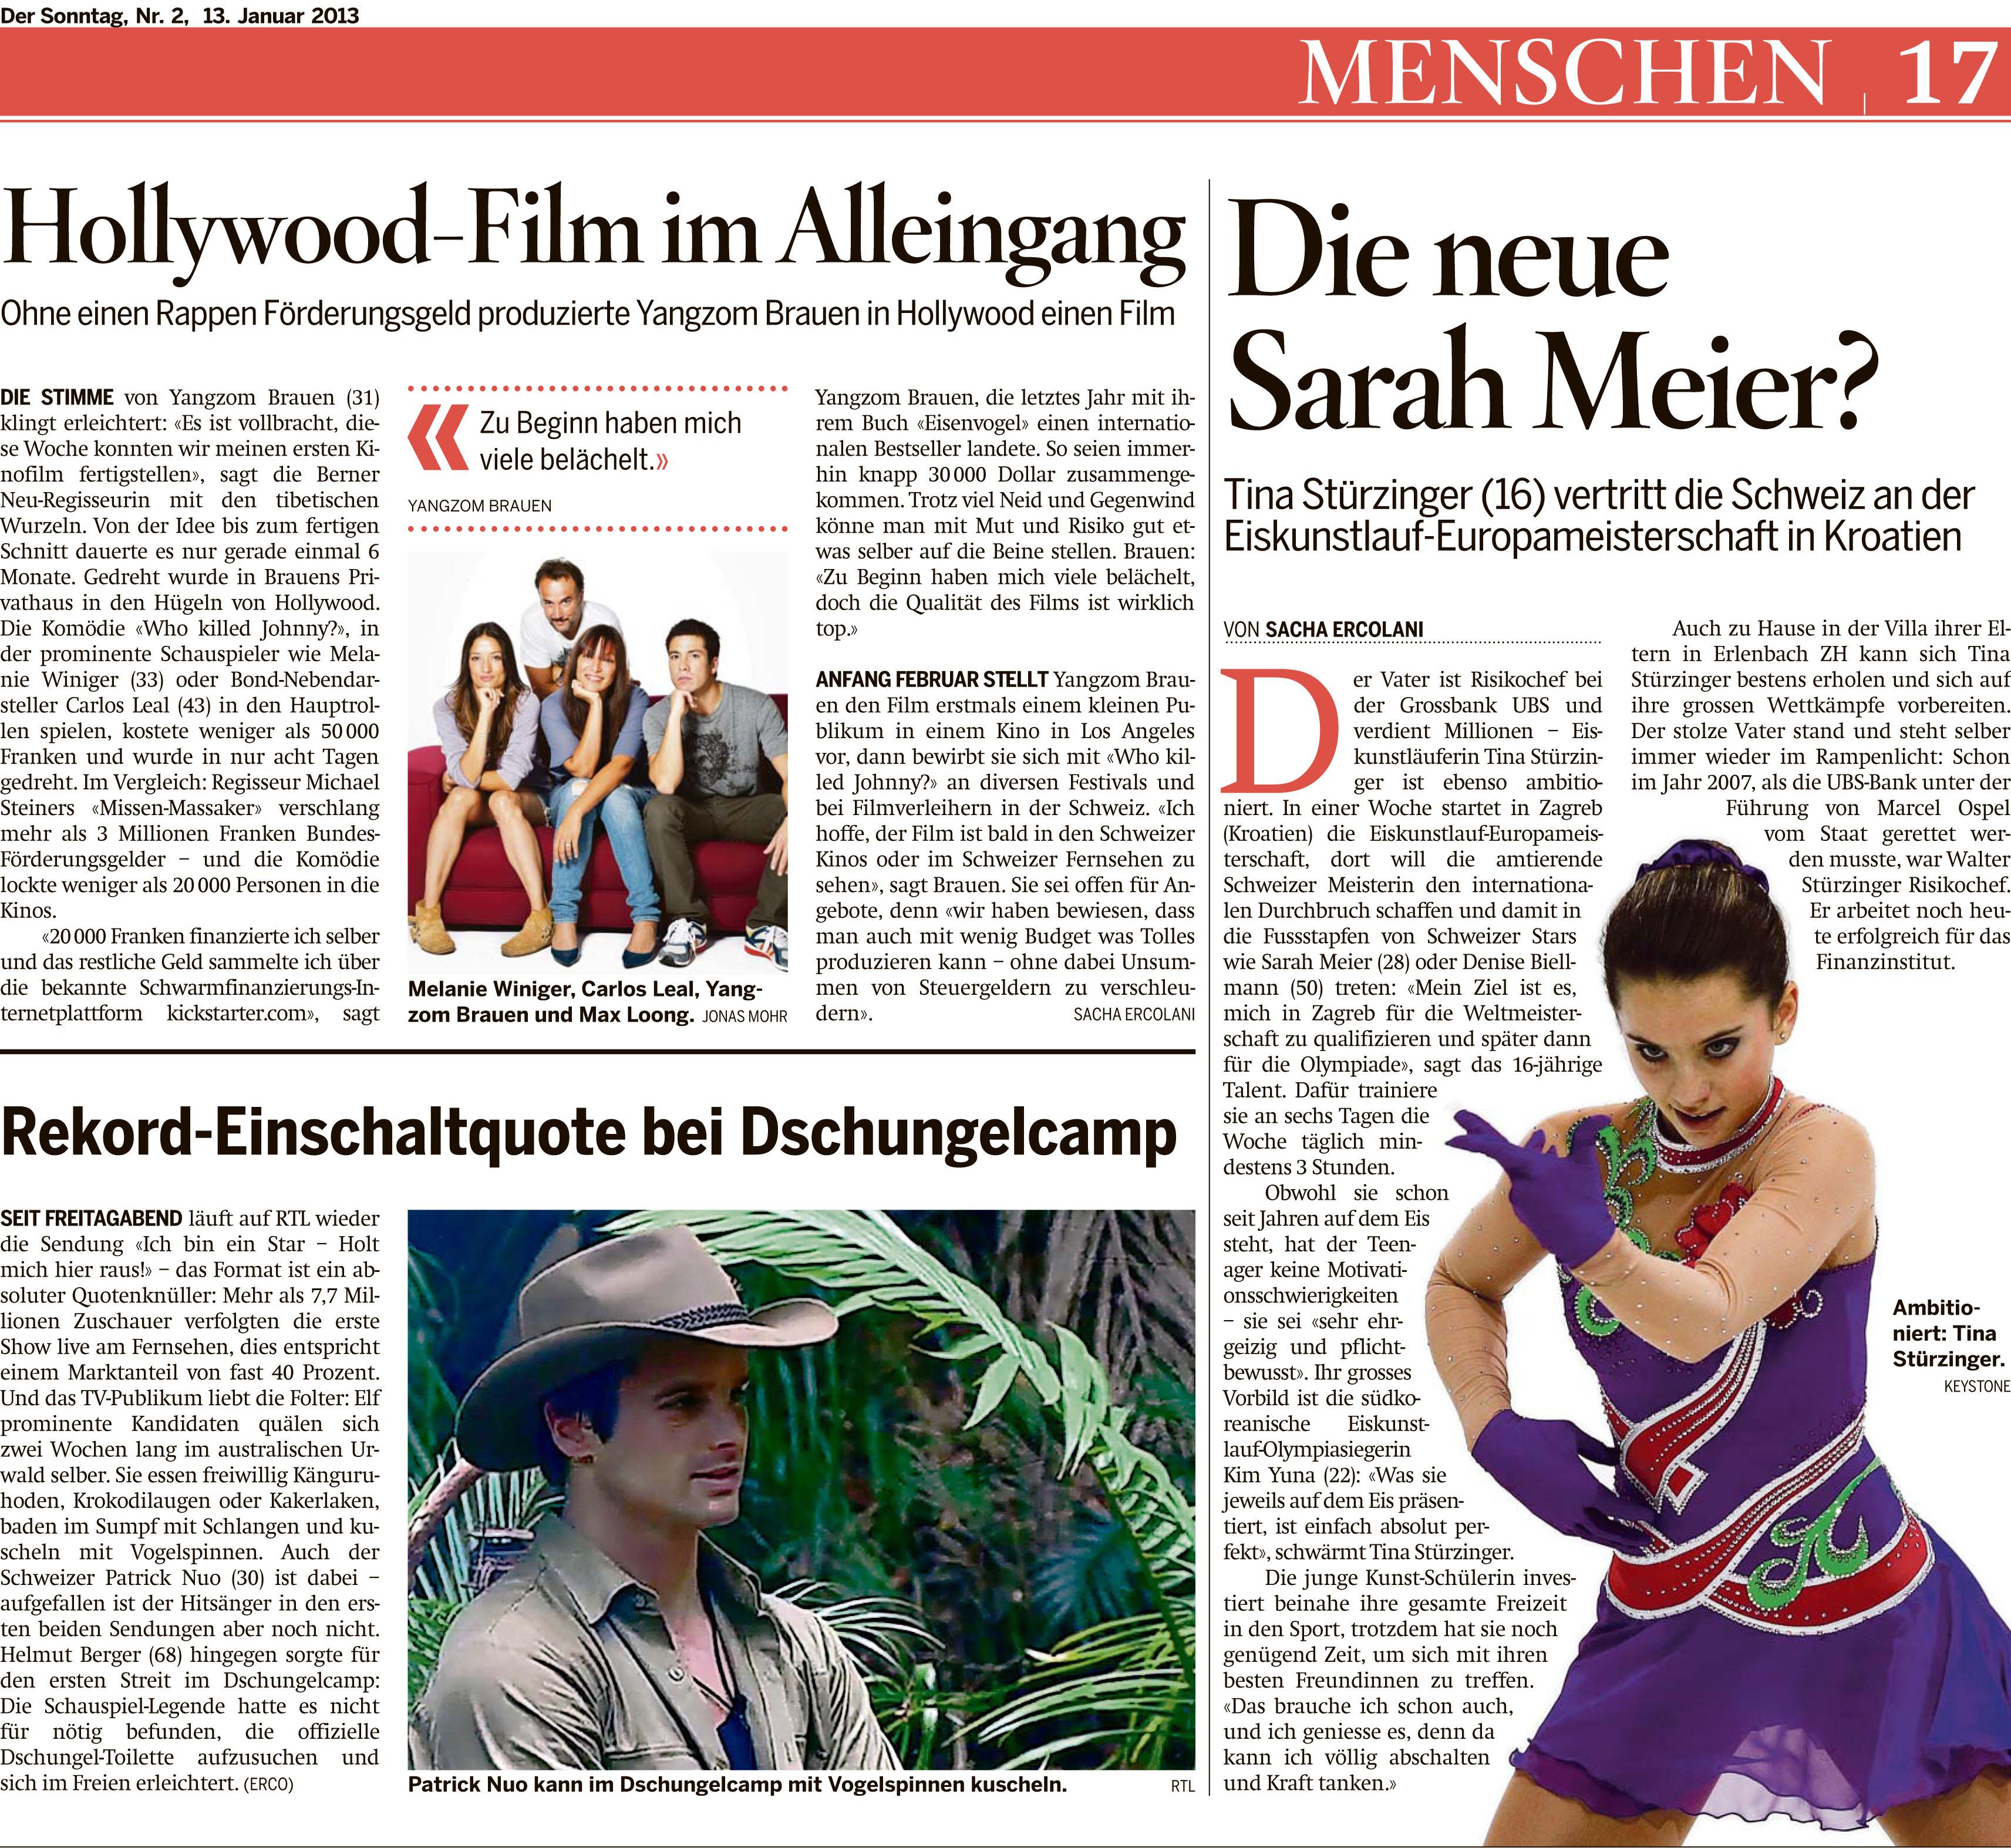 Sonntag Newspaper